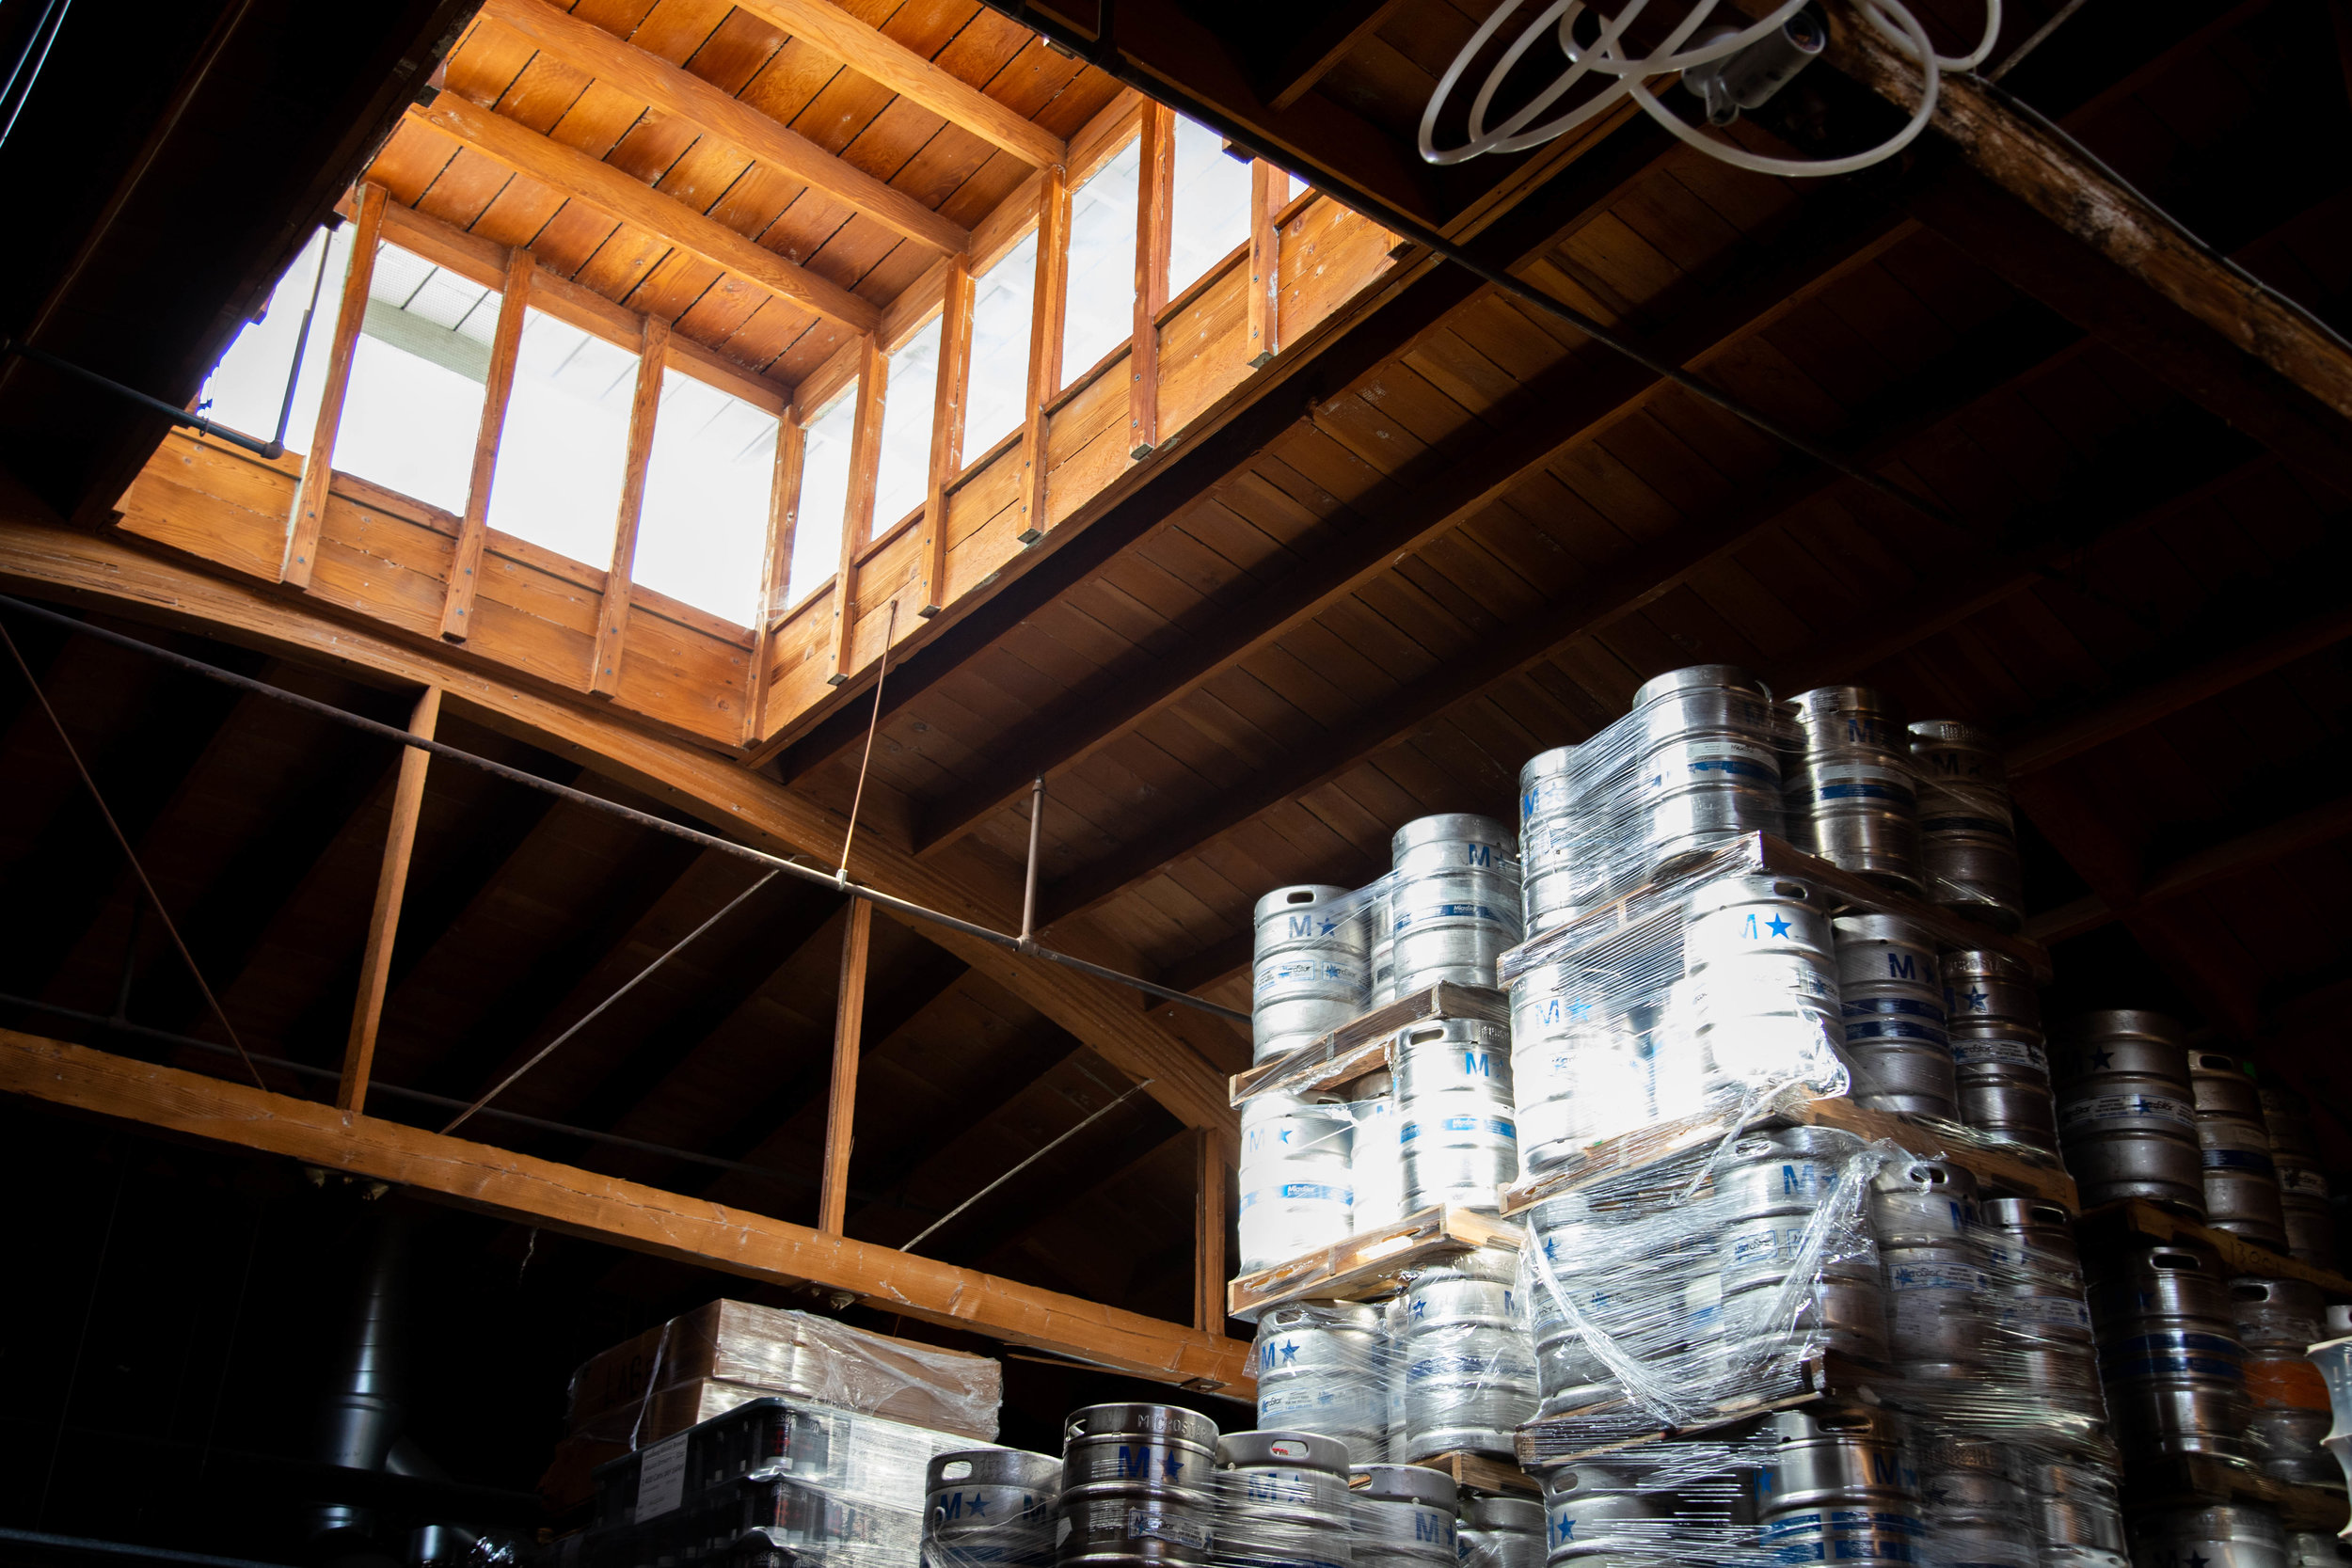 Detour: San Diego, CA – Mission Brewery